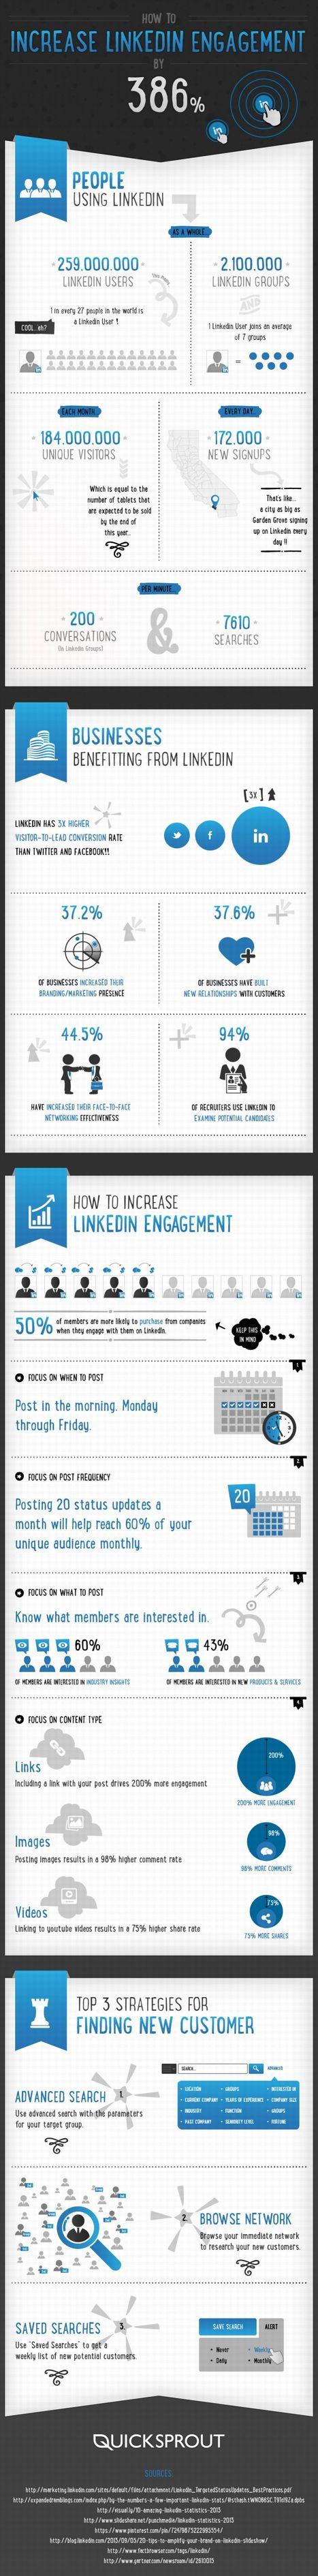 ENGAGEMENT on LinkedIn [INFOGRAPHIC] | Social Media e Innovación Tecnológica | Scoop.it